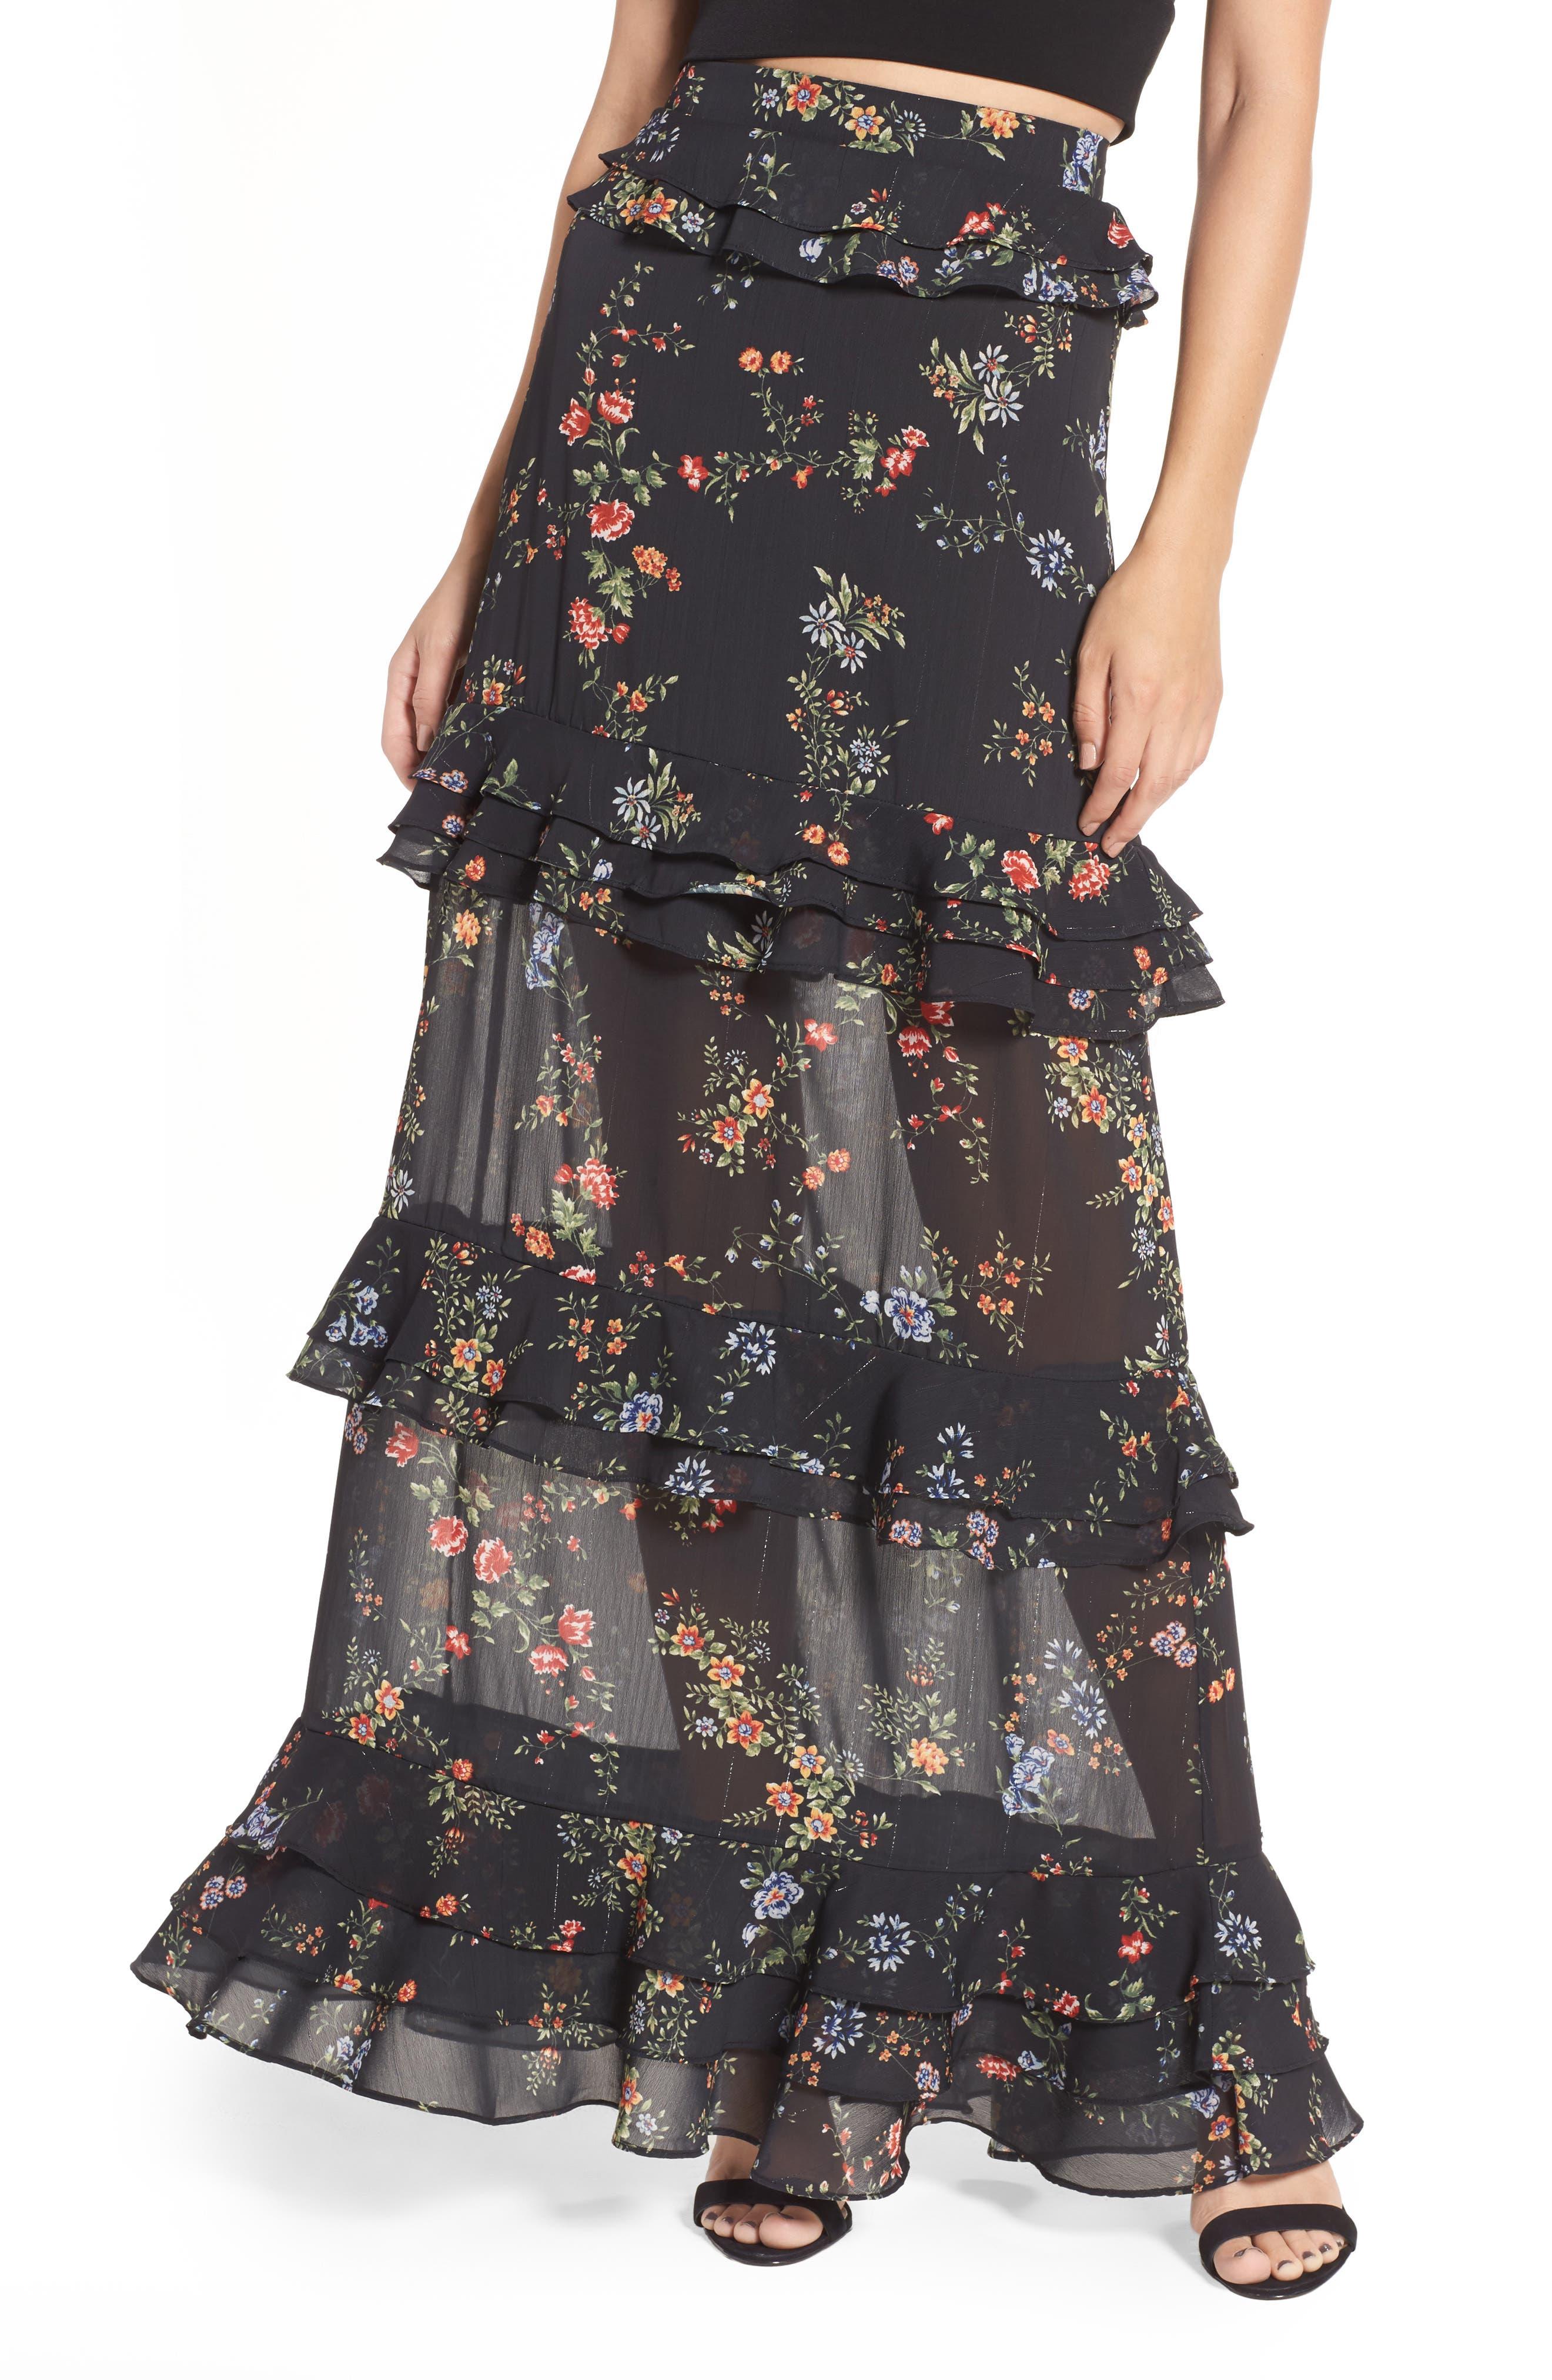 ARRIVE Otis Ruffle Maxi Skirt